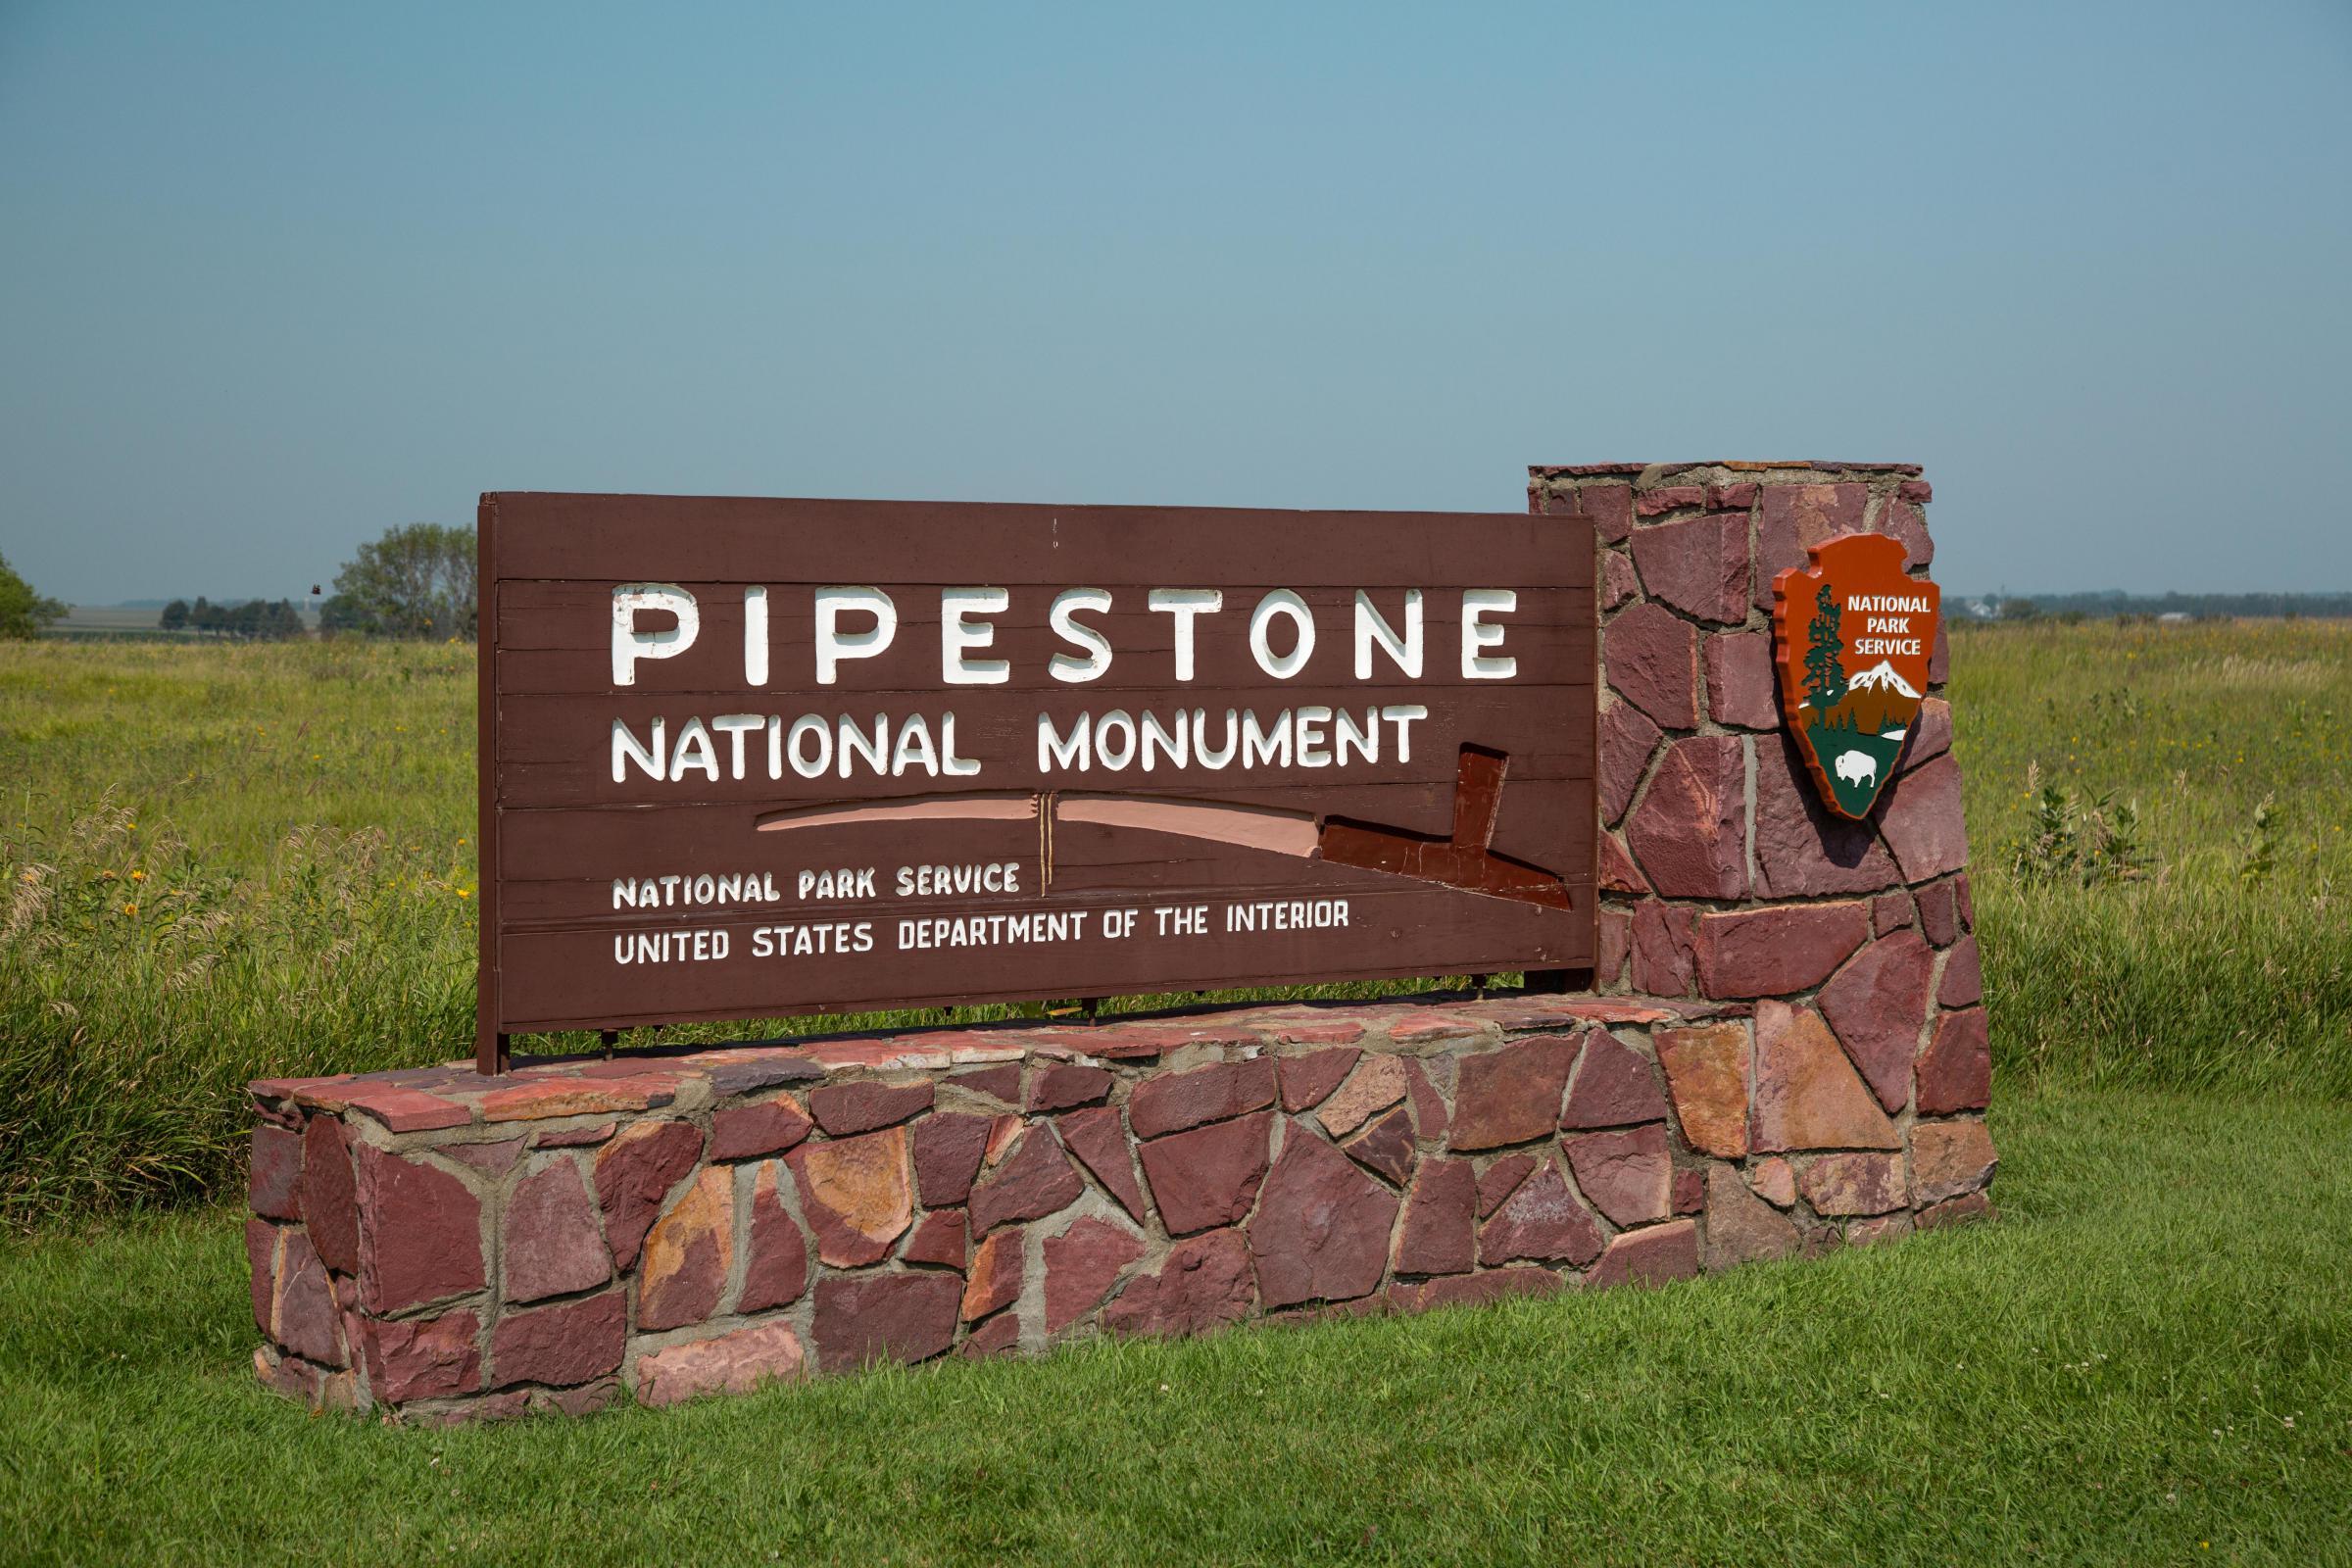 Pipestone National Monument, Pipestone, MN